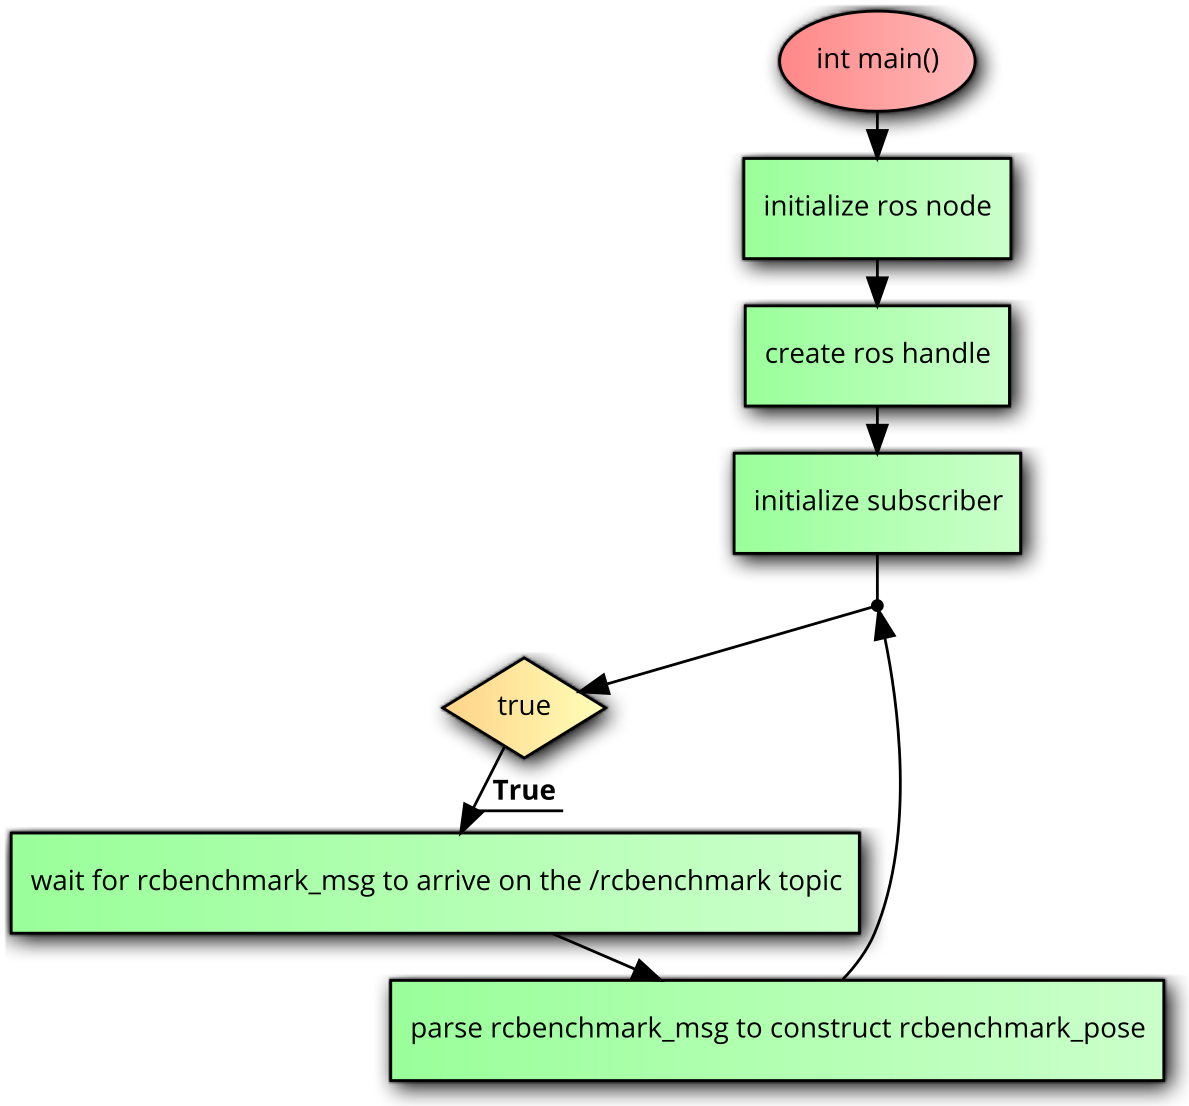 RCbenchmark ROS/Gazebo Tutorial (C++) - Thrust Stand and Dynamometer